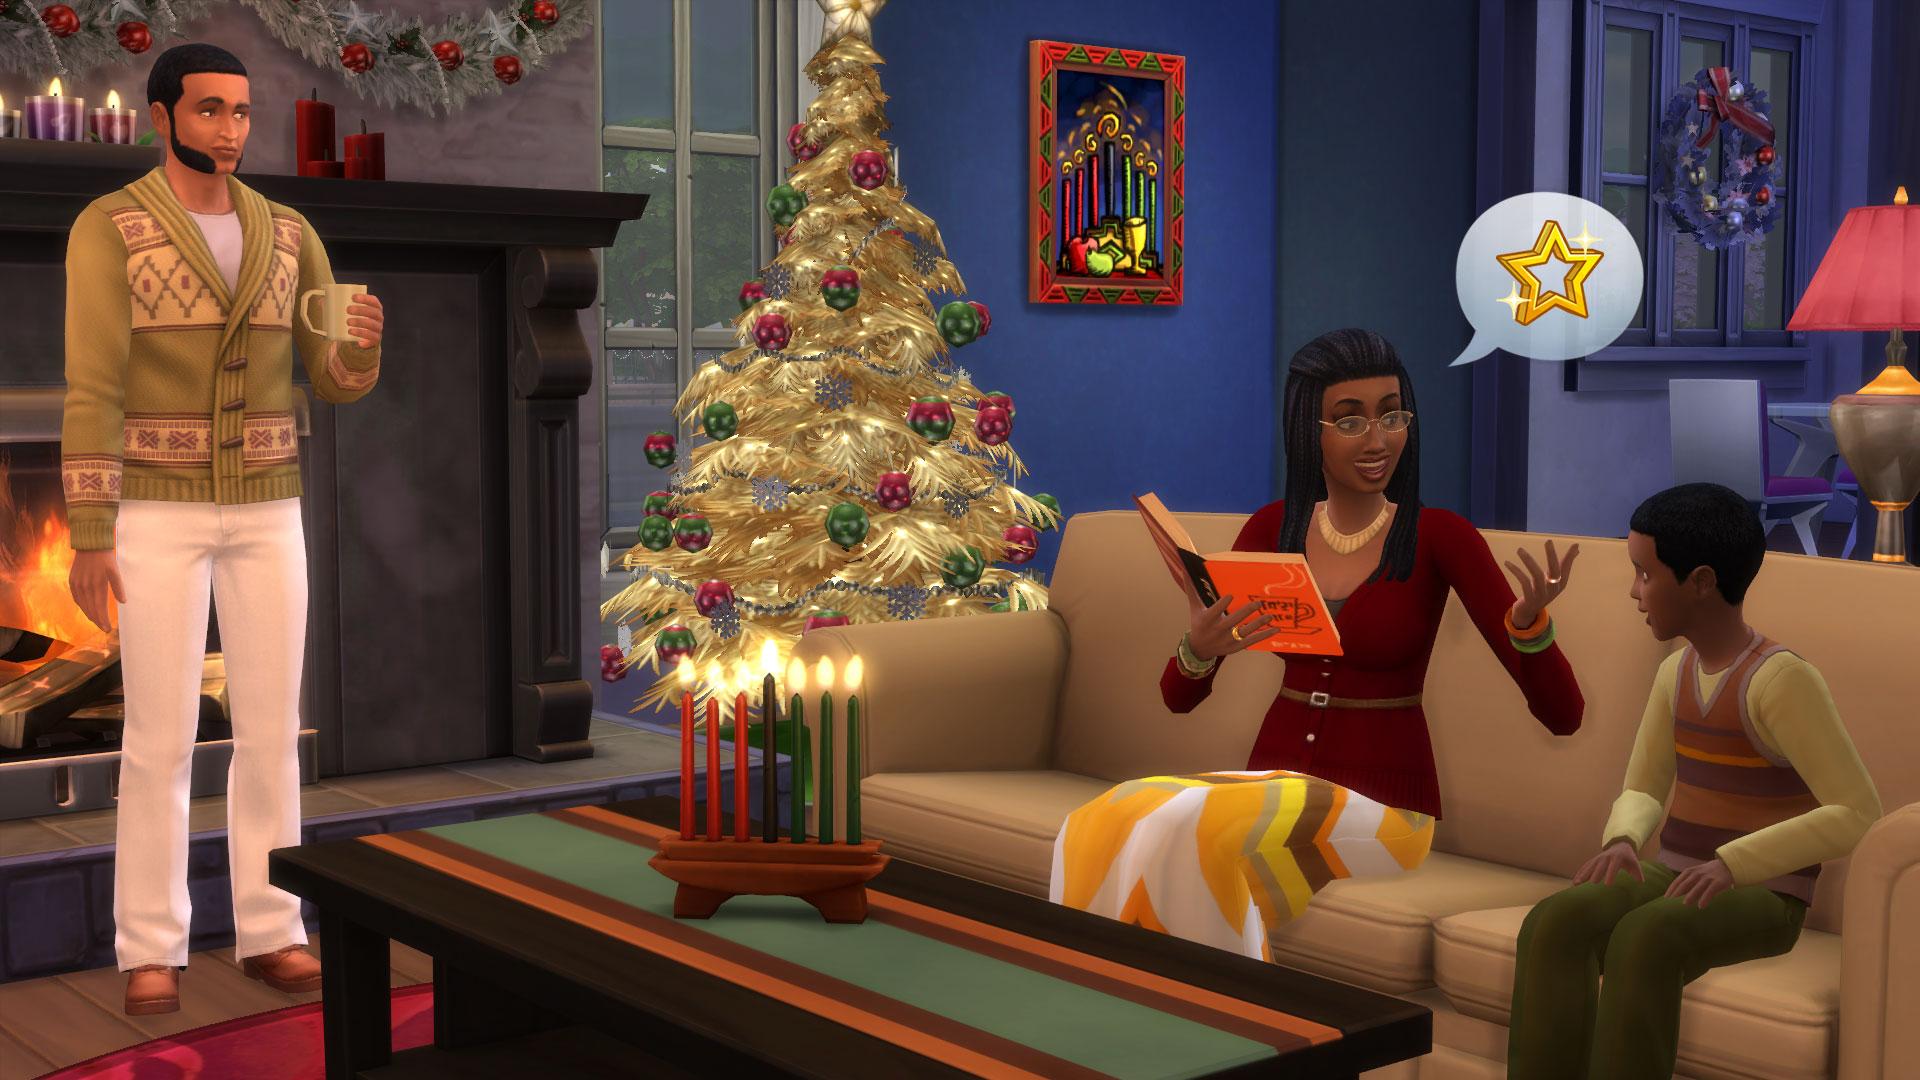 Addobbi Natalizi The Sims 3.Thesims4 It Community Italiana Dedicata A The Sims 4